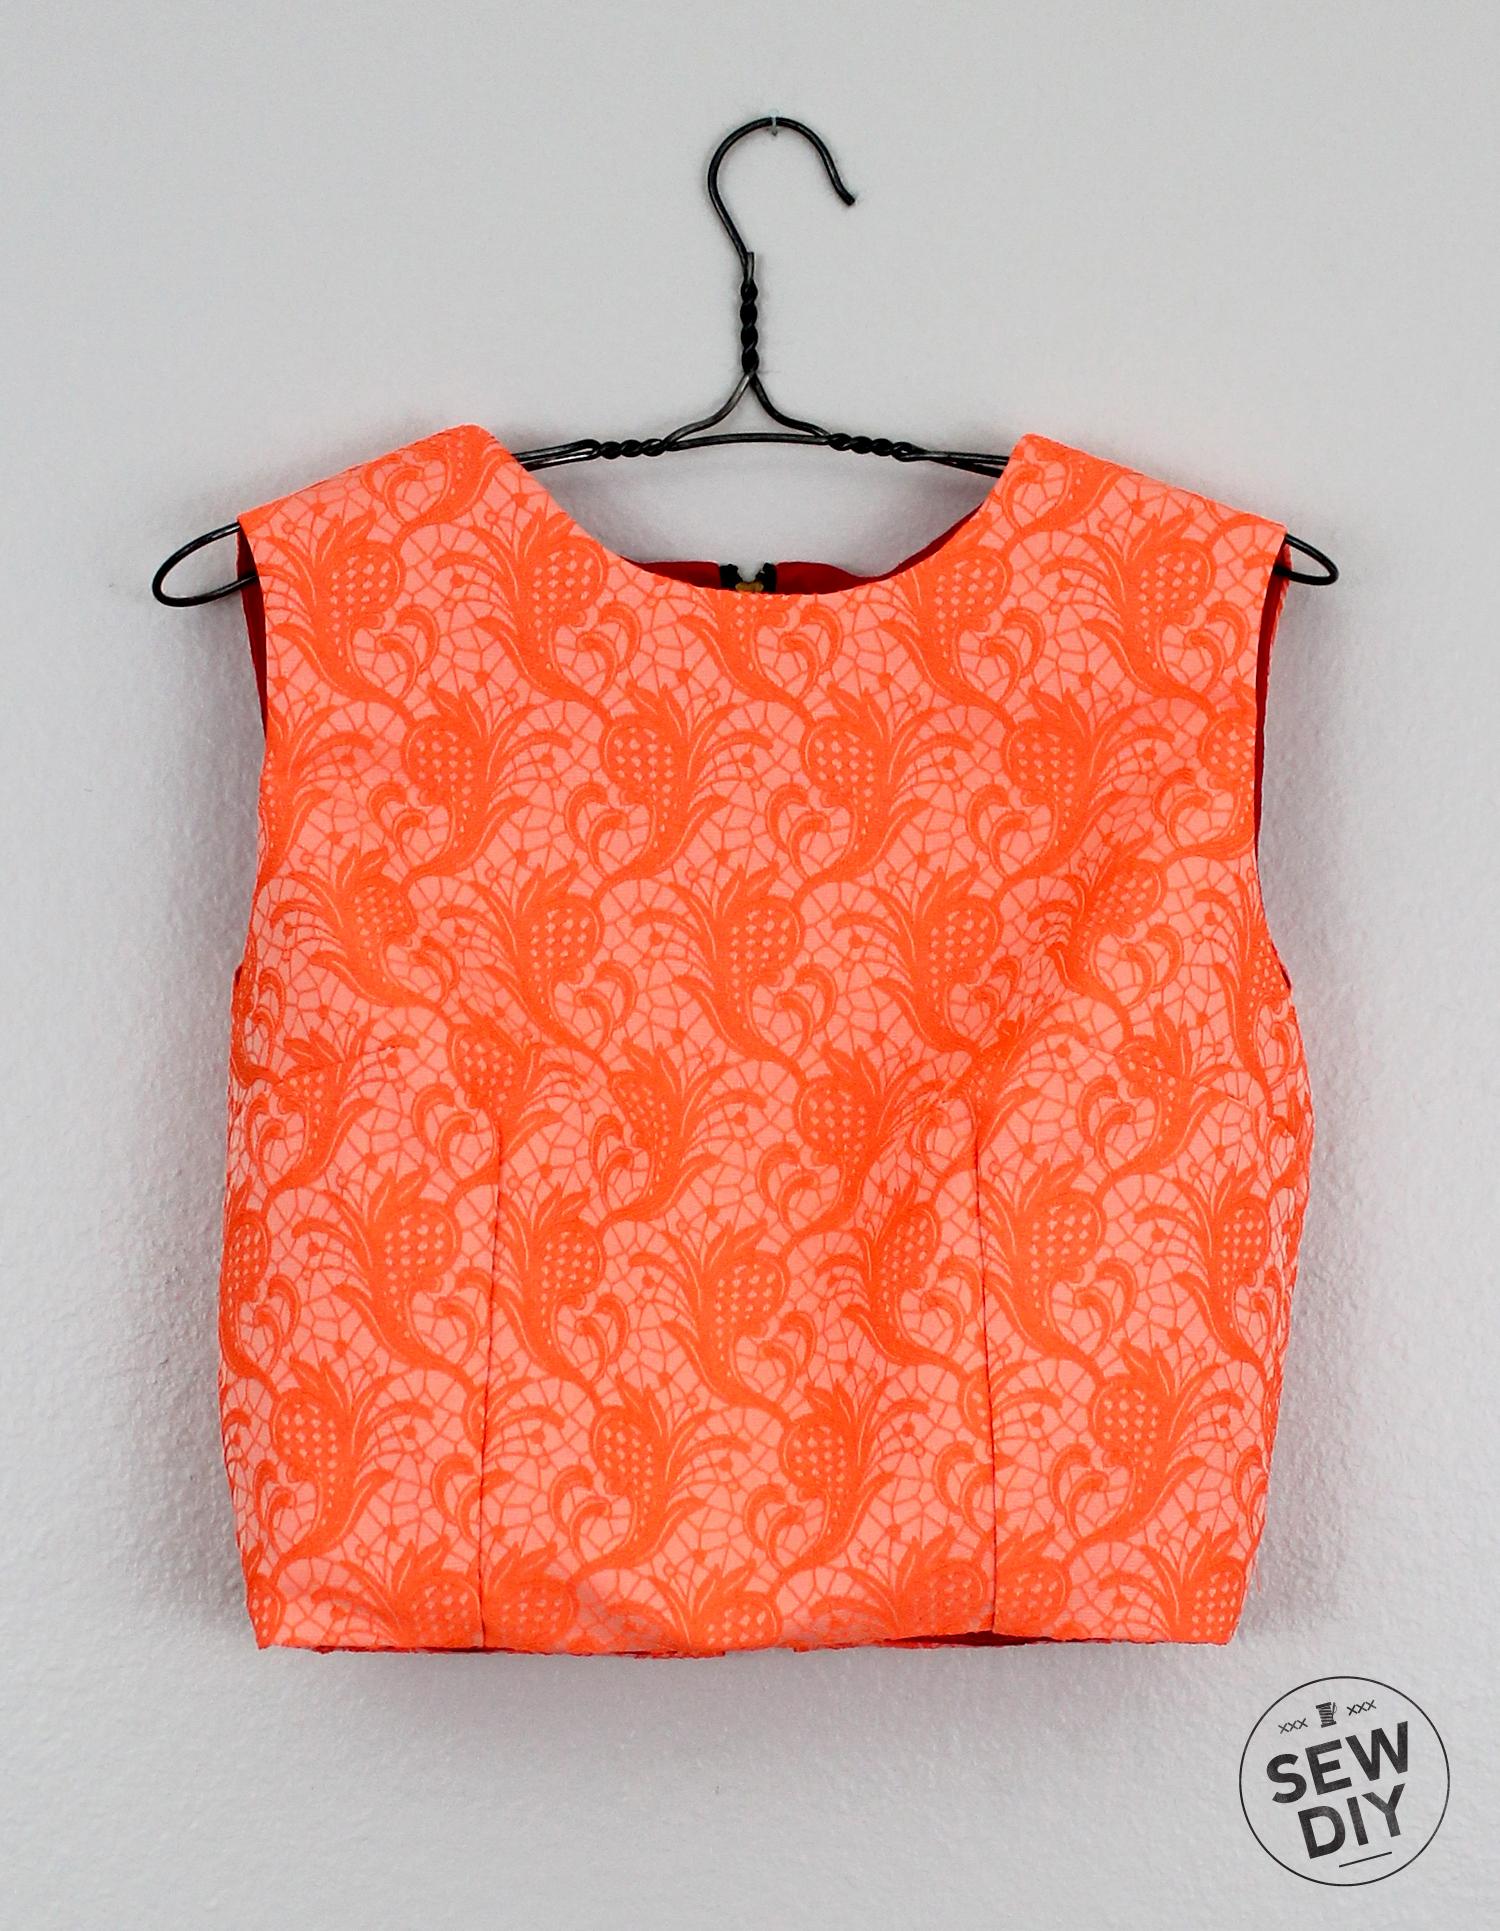 Sew DIY Brocade Crop Top